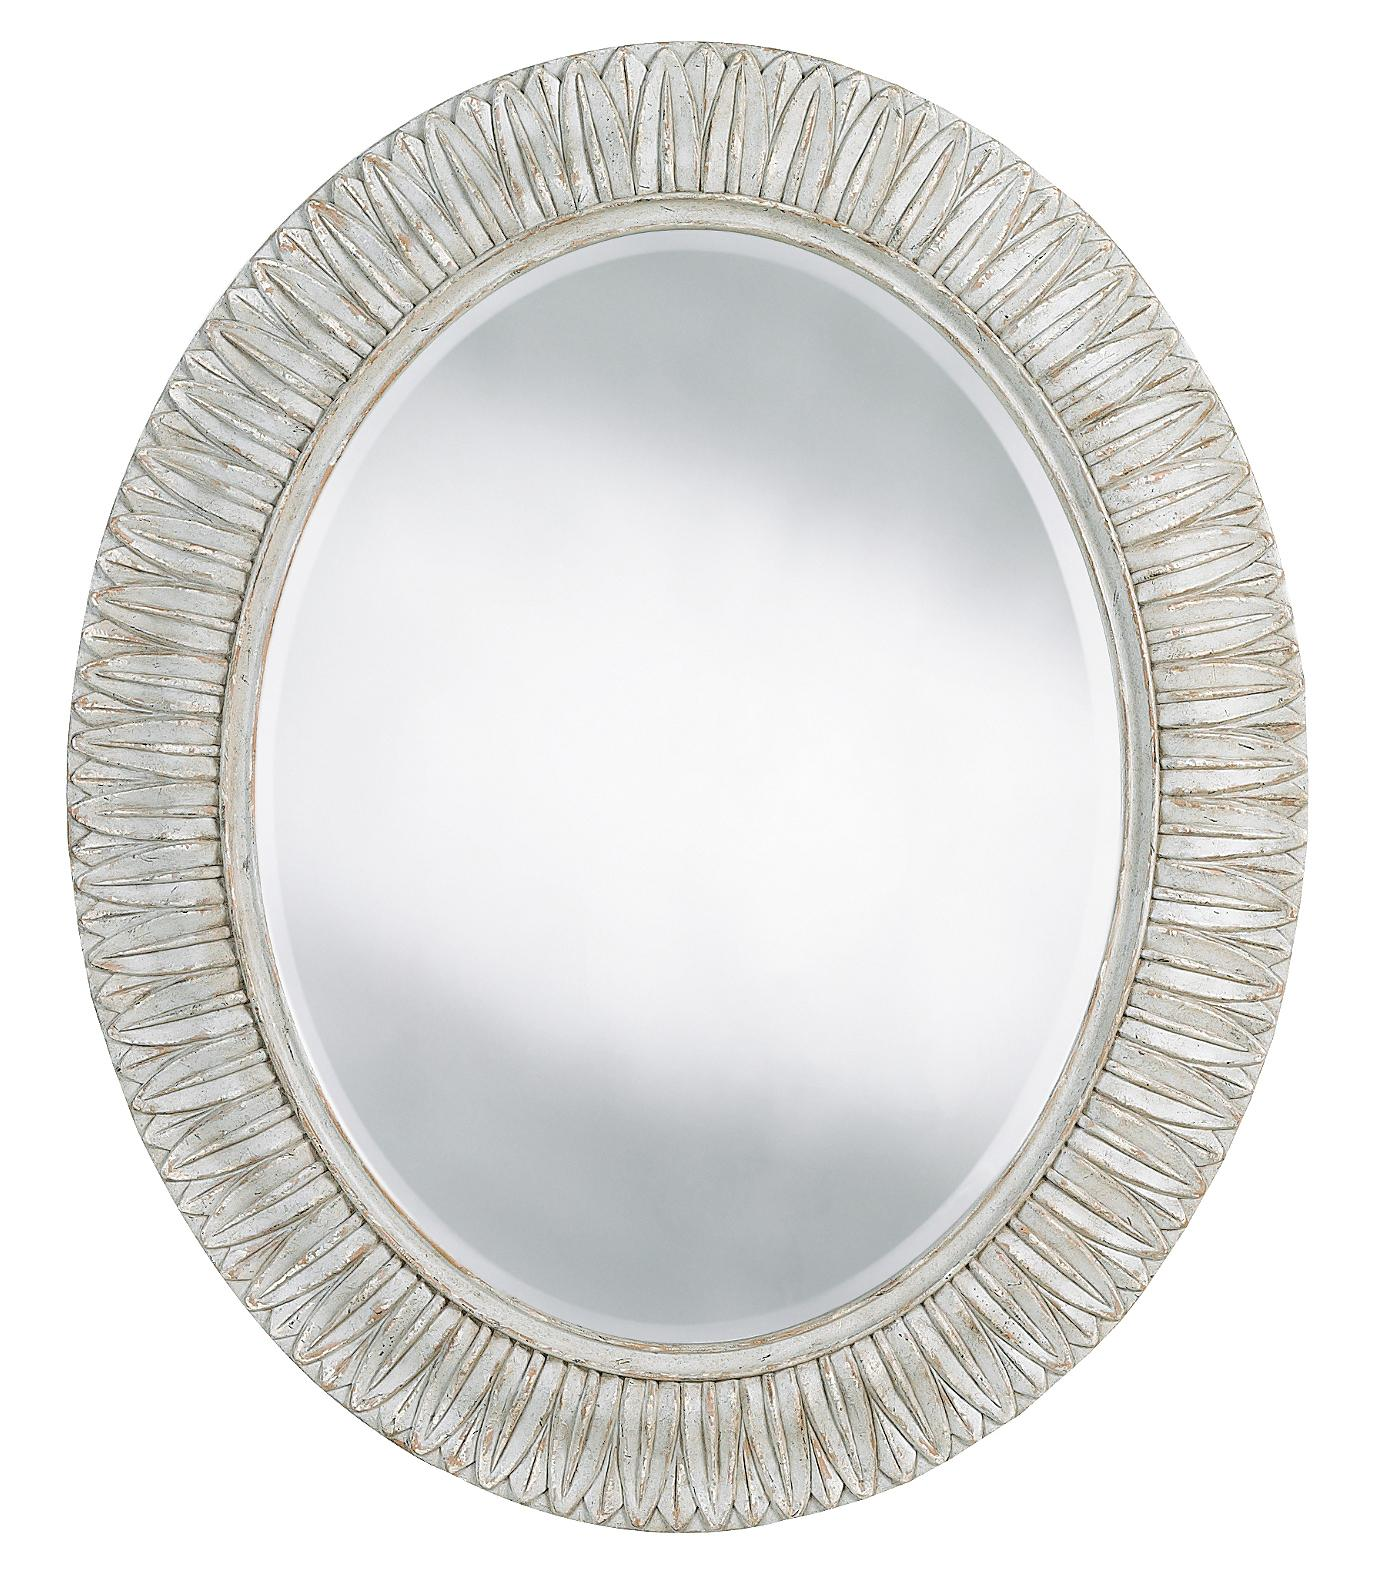 Stanley Furniture Arrondissement Jardin Mirror - Item Number: 222-23-31